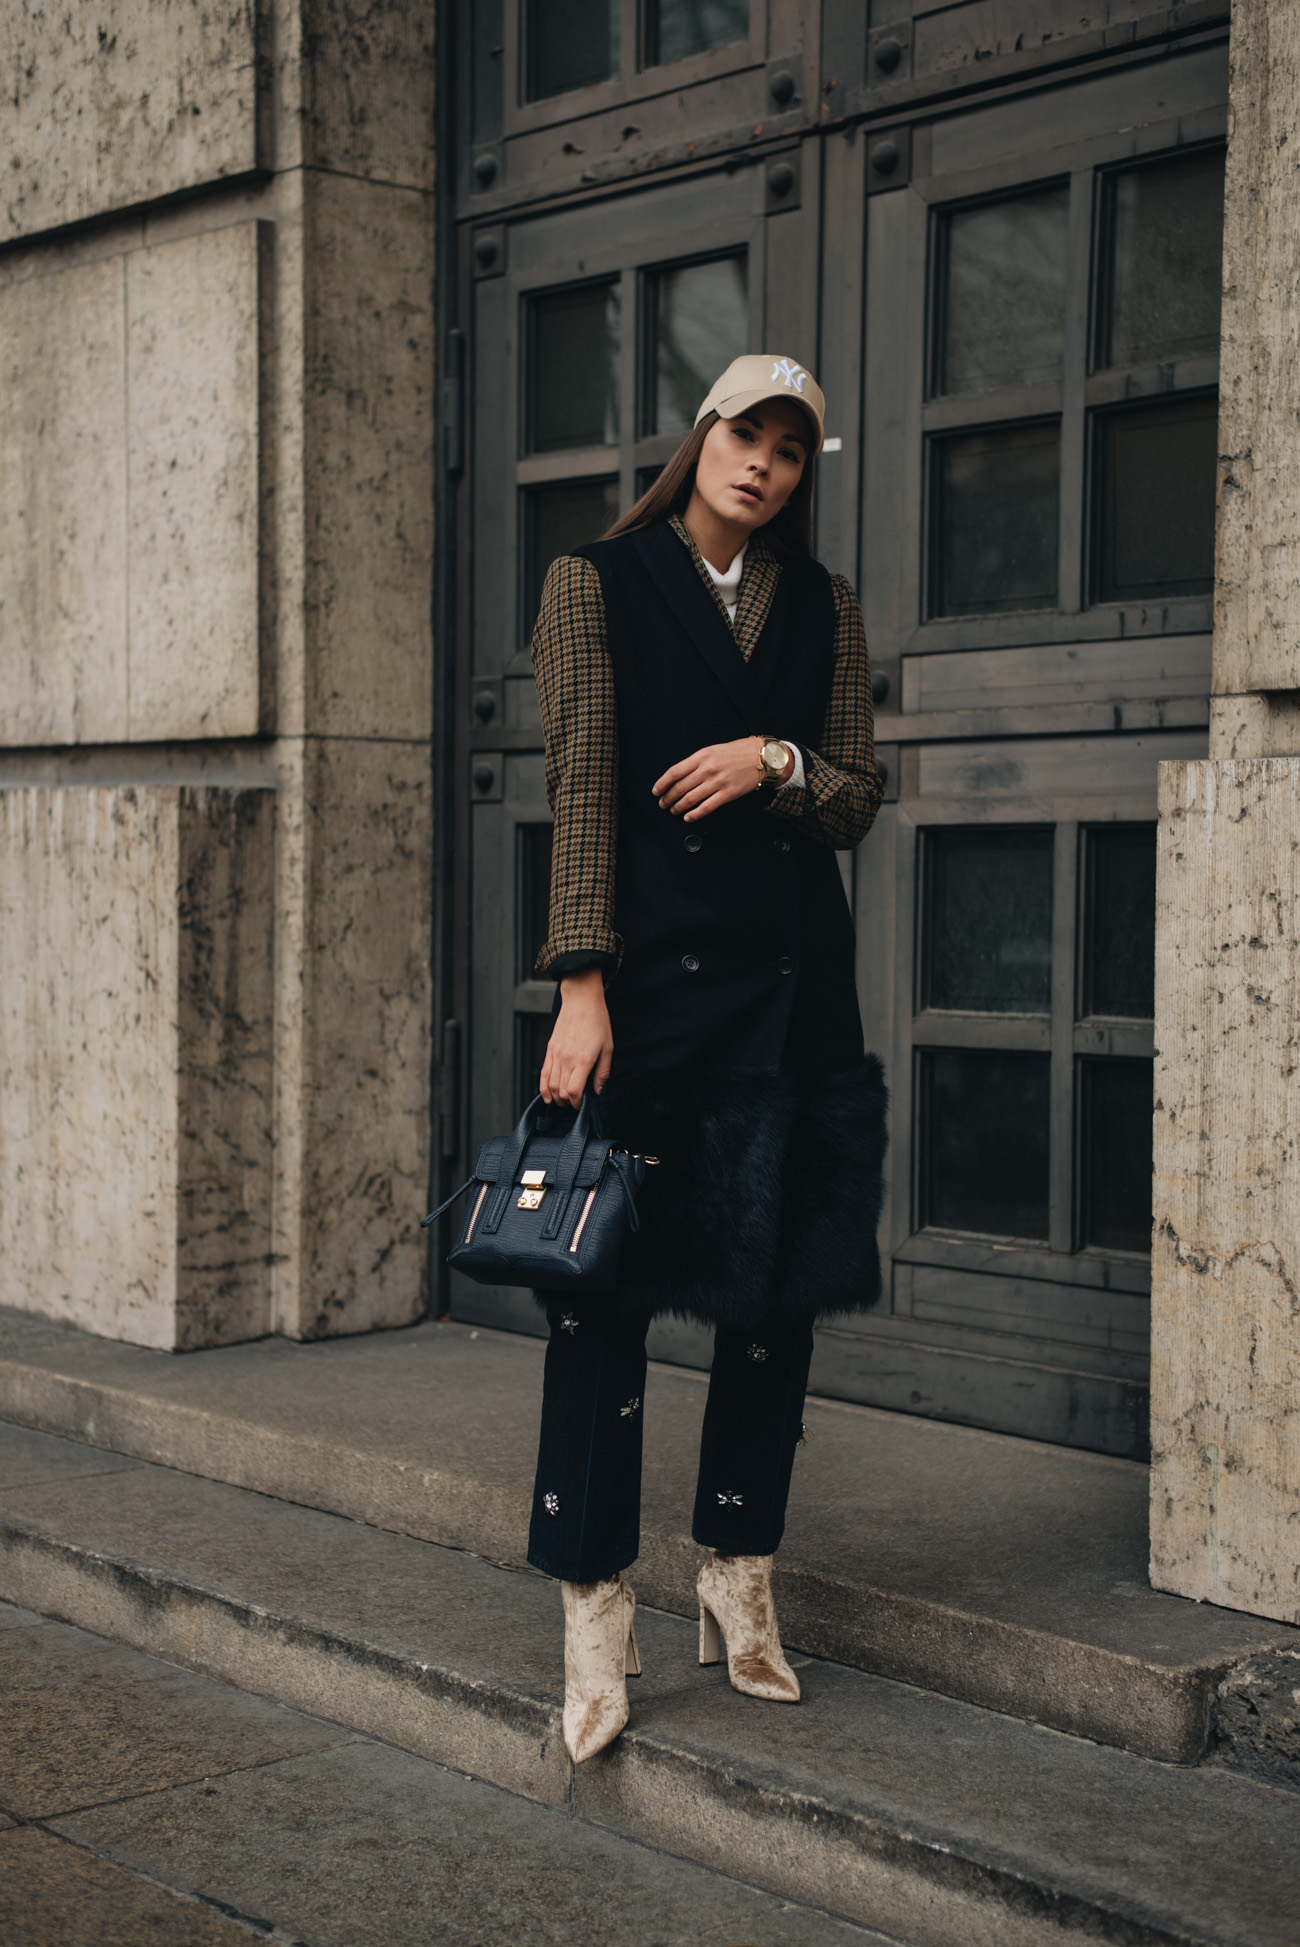 mode-bloggerin-nina-schwichtenberg-streetstyle-mode-trends-herbst-winter-2017-Long-Weste-Sock-Boots-Samt-Jimmy-Choo-Jeans-mit-Applikationen-fashiioncarpet